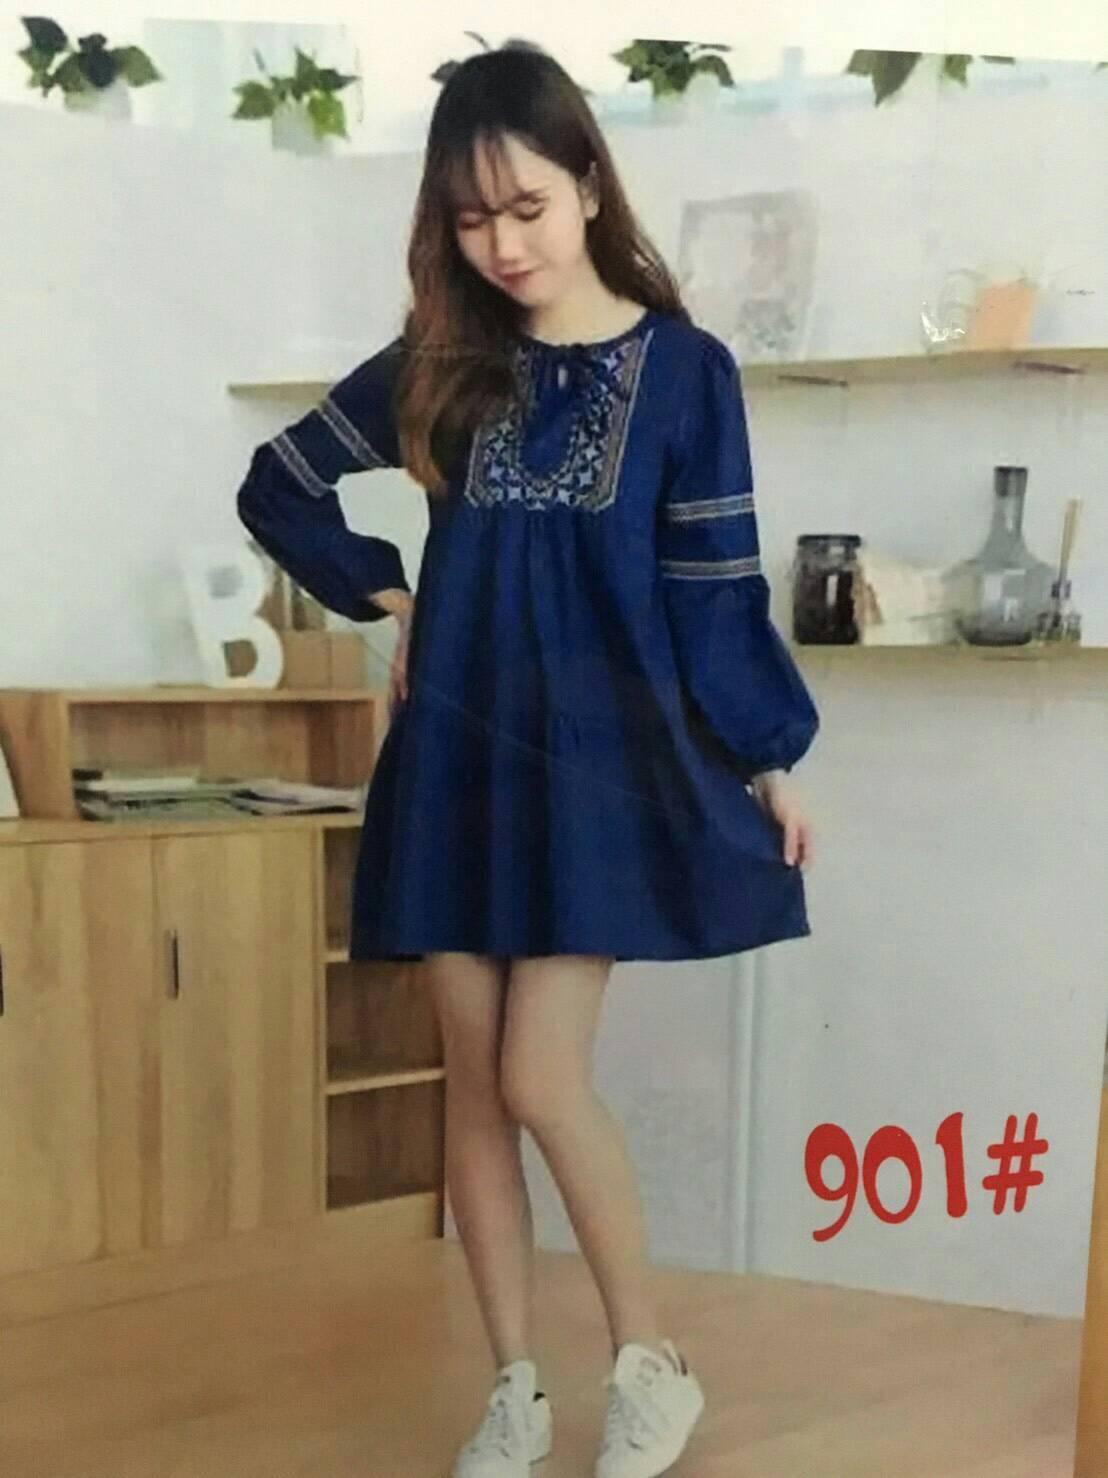 Rita embroidery waist tie cotton dress